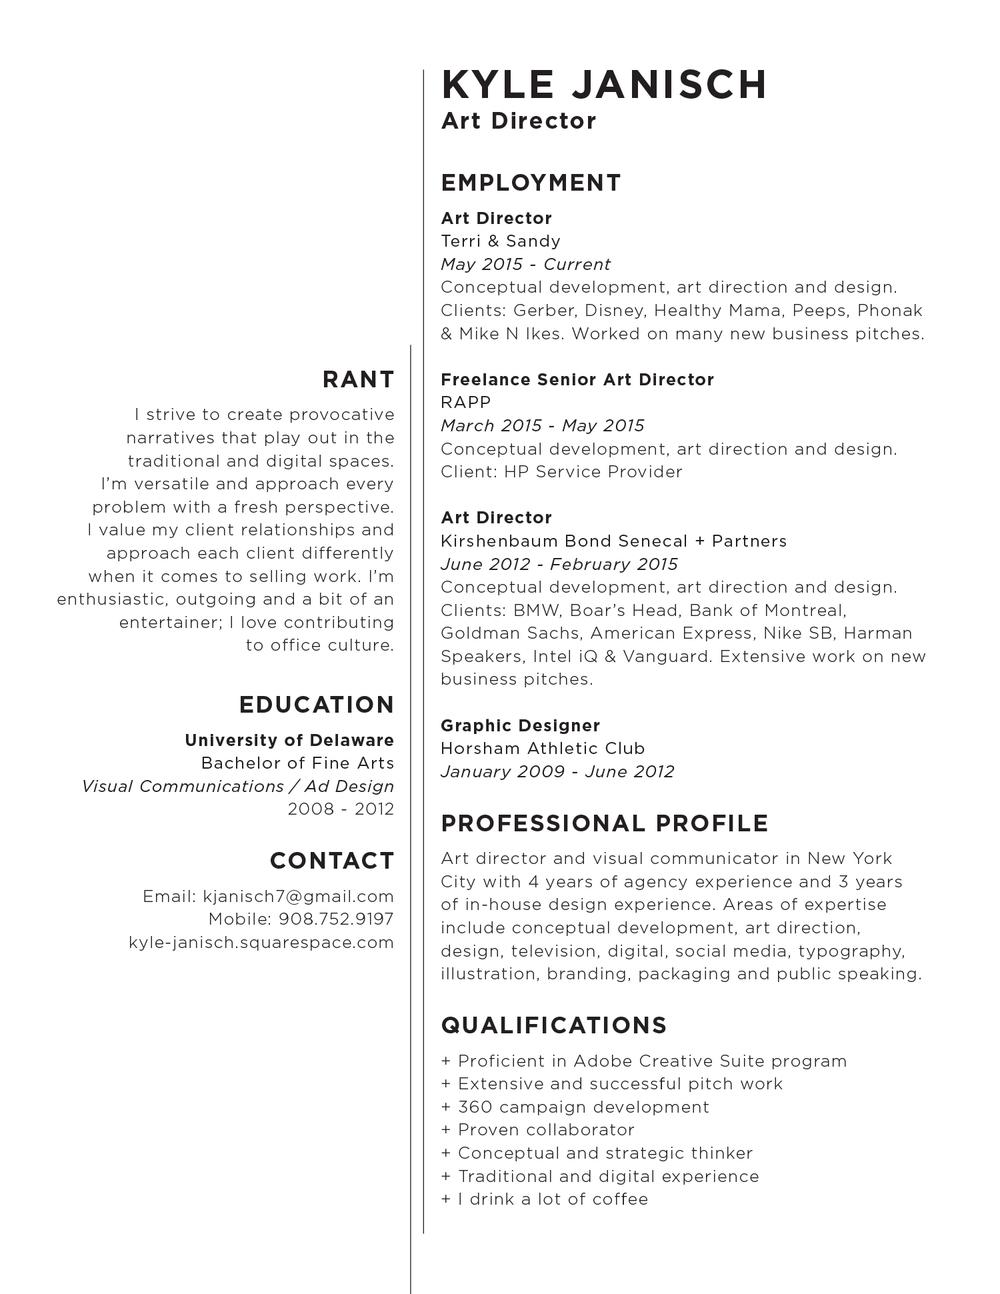 kylejanisch_resumejpg - Art Director Resume